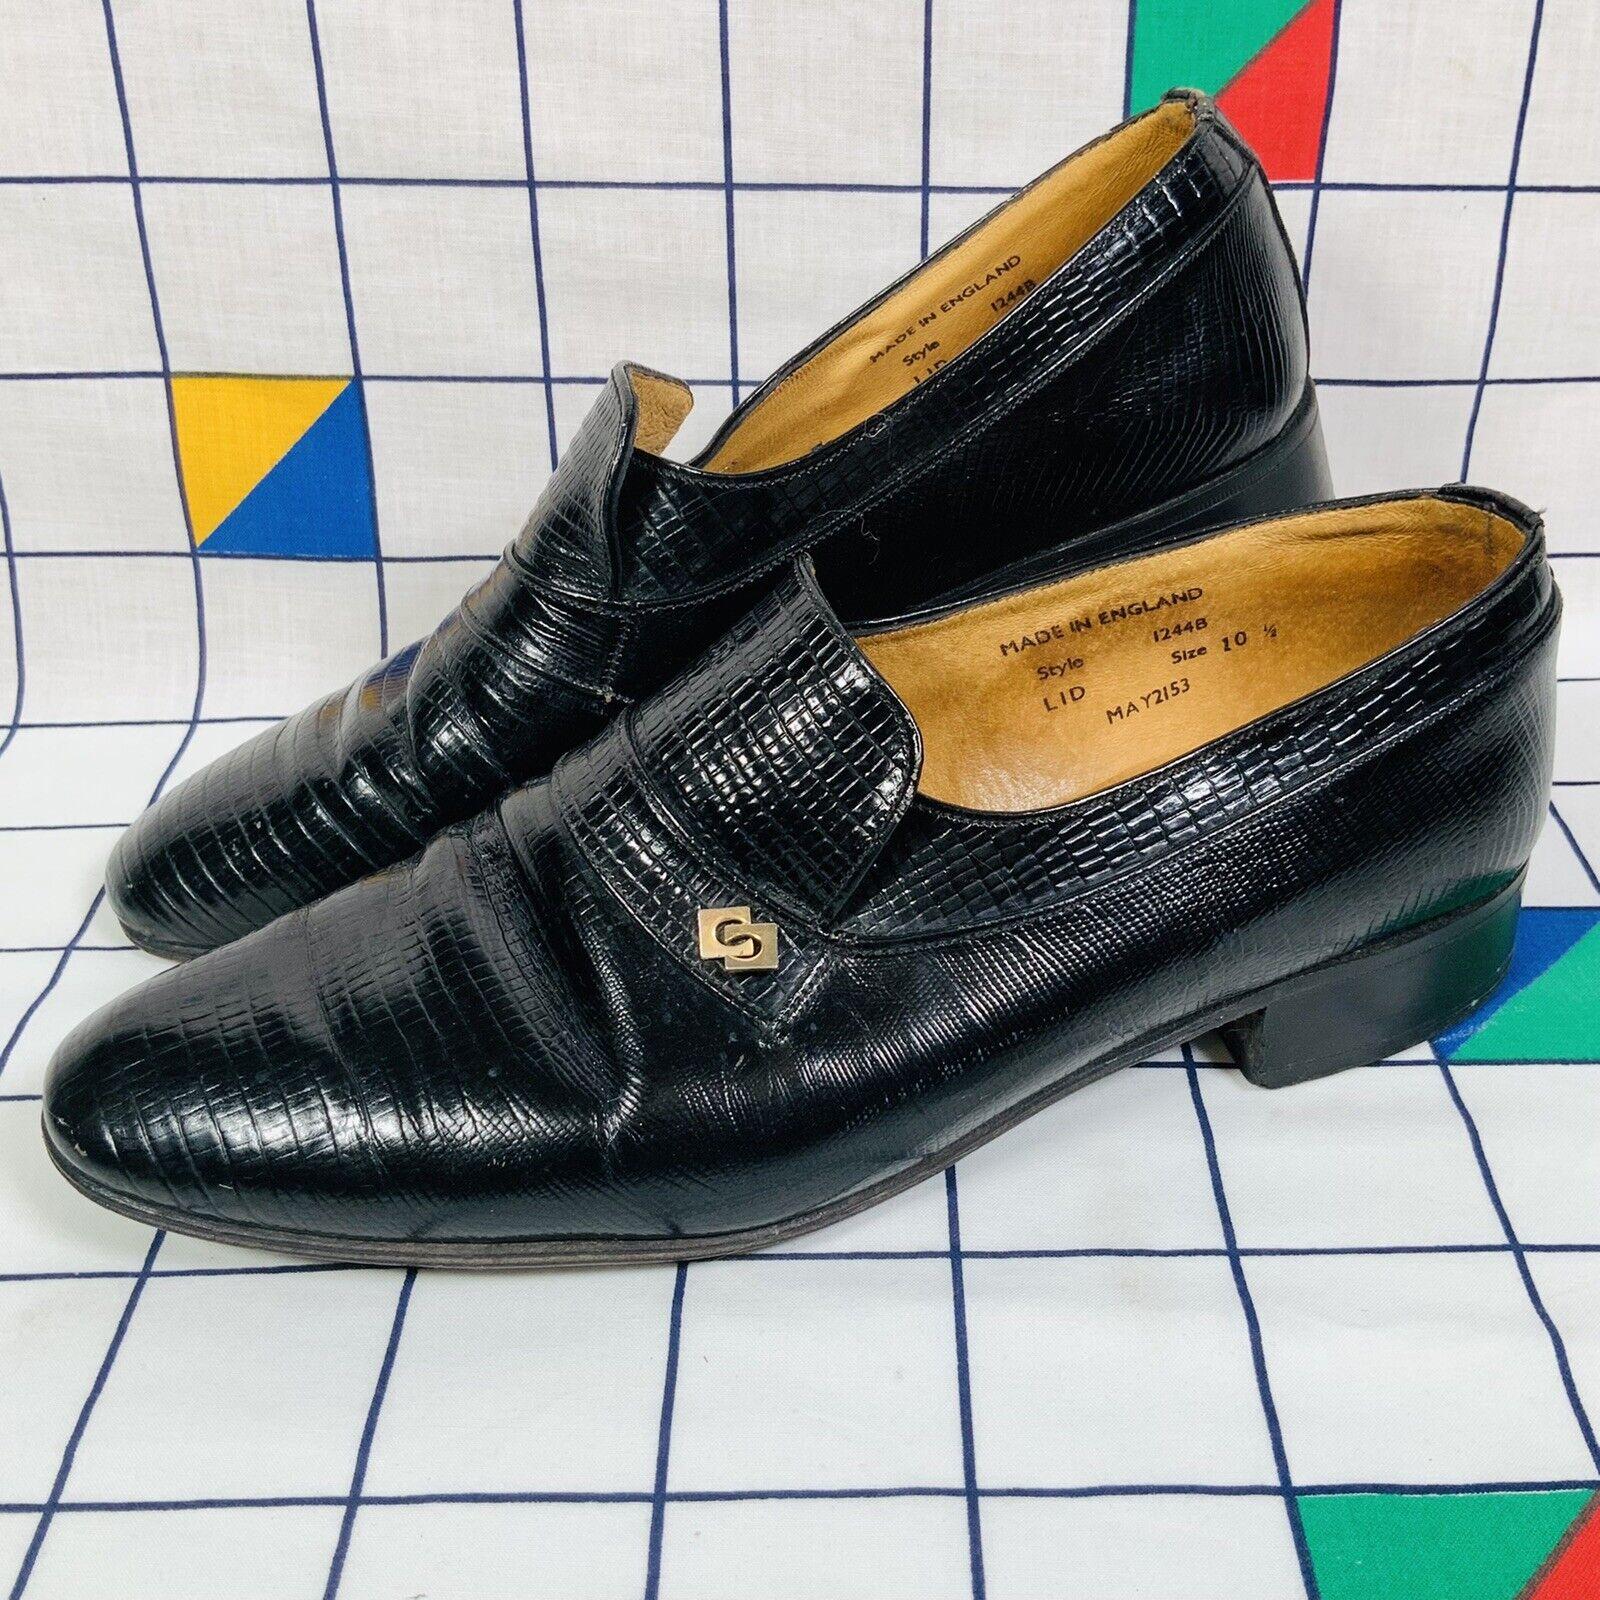 Sanders Horsebite Vintage English Black Leather Shoes Loafers UK Size 10.5